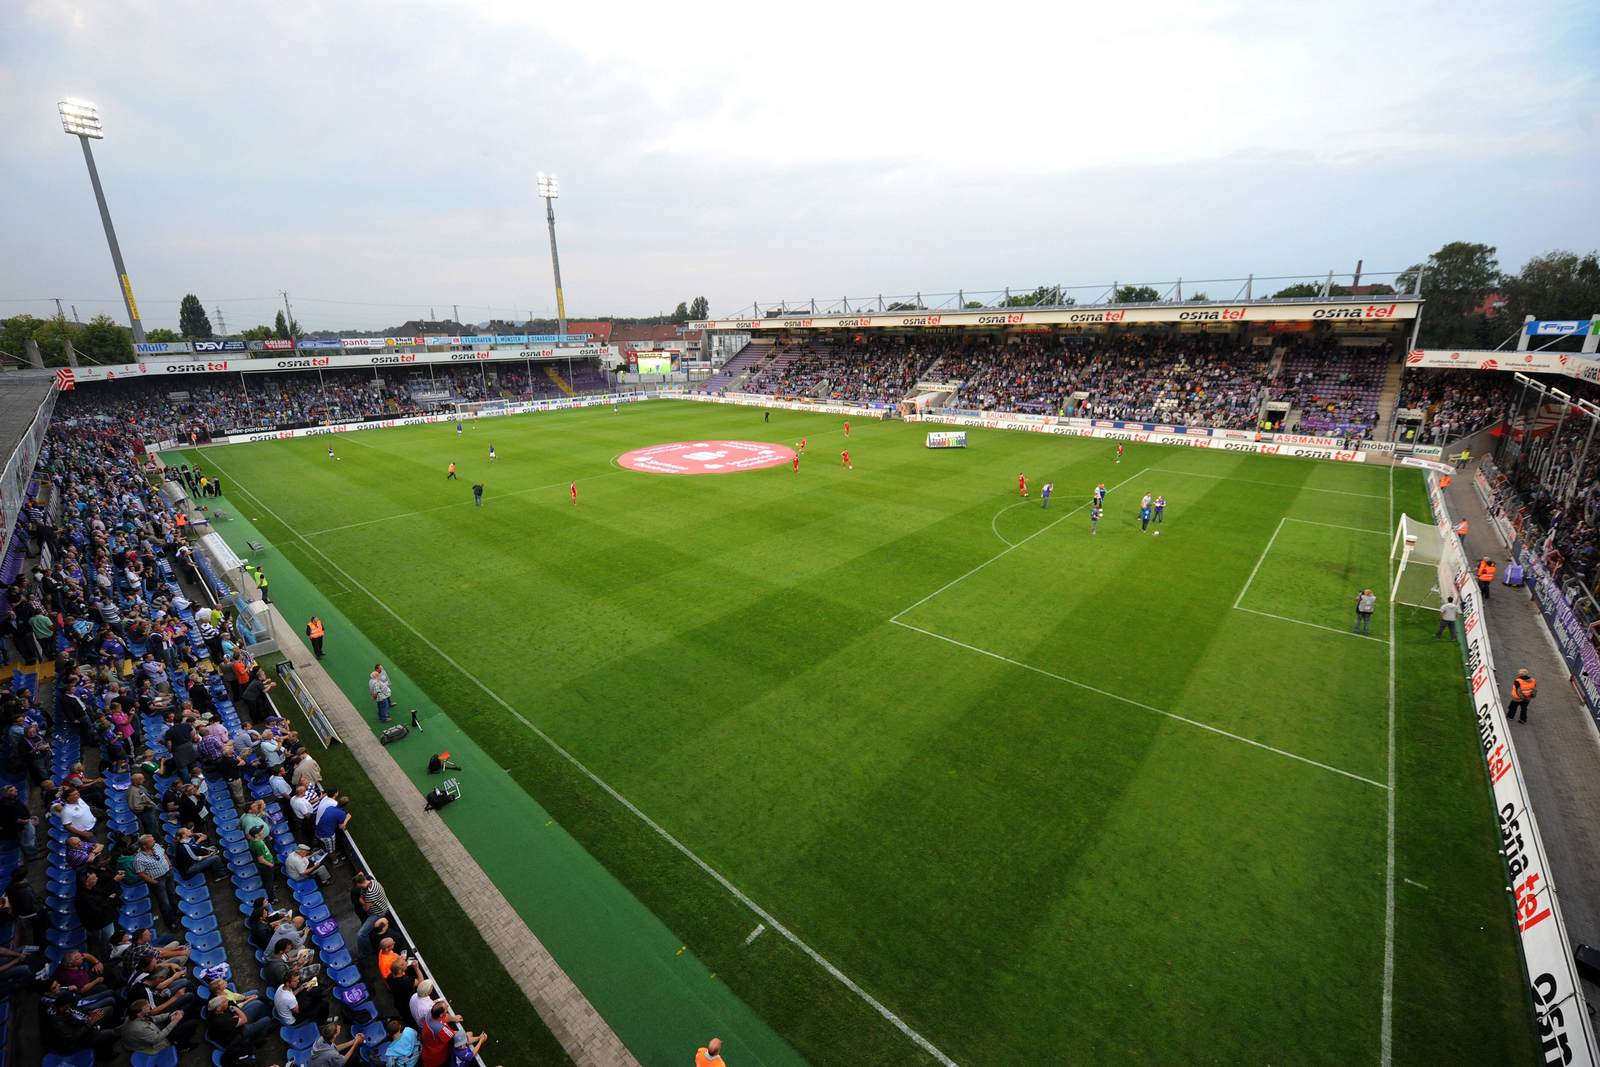 VfL Osnabrück: Stadionvorstellung